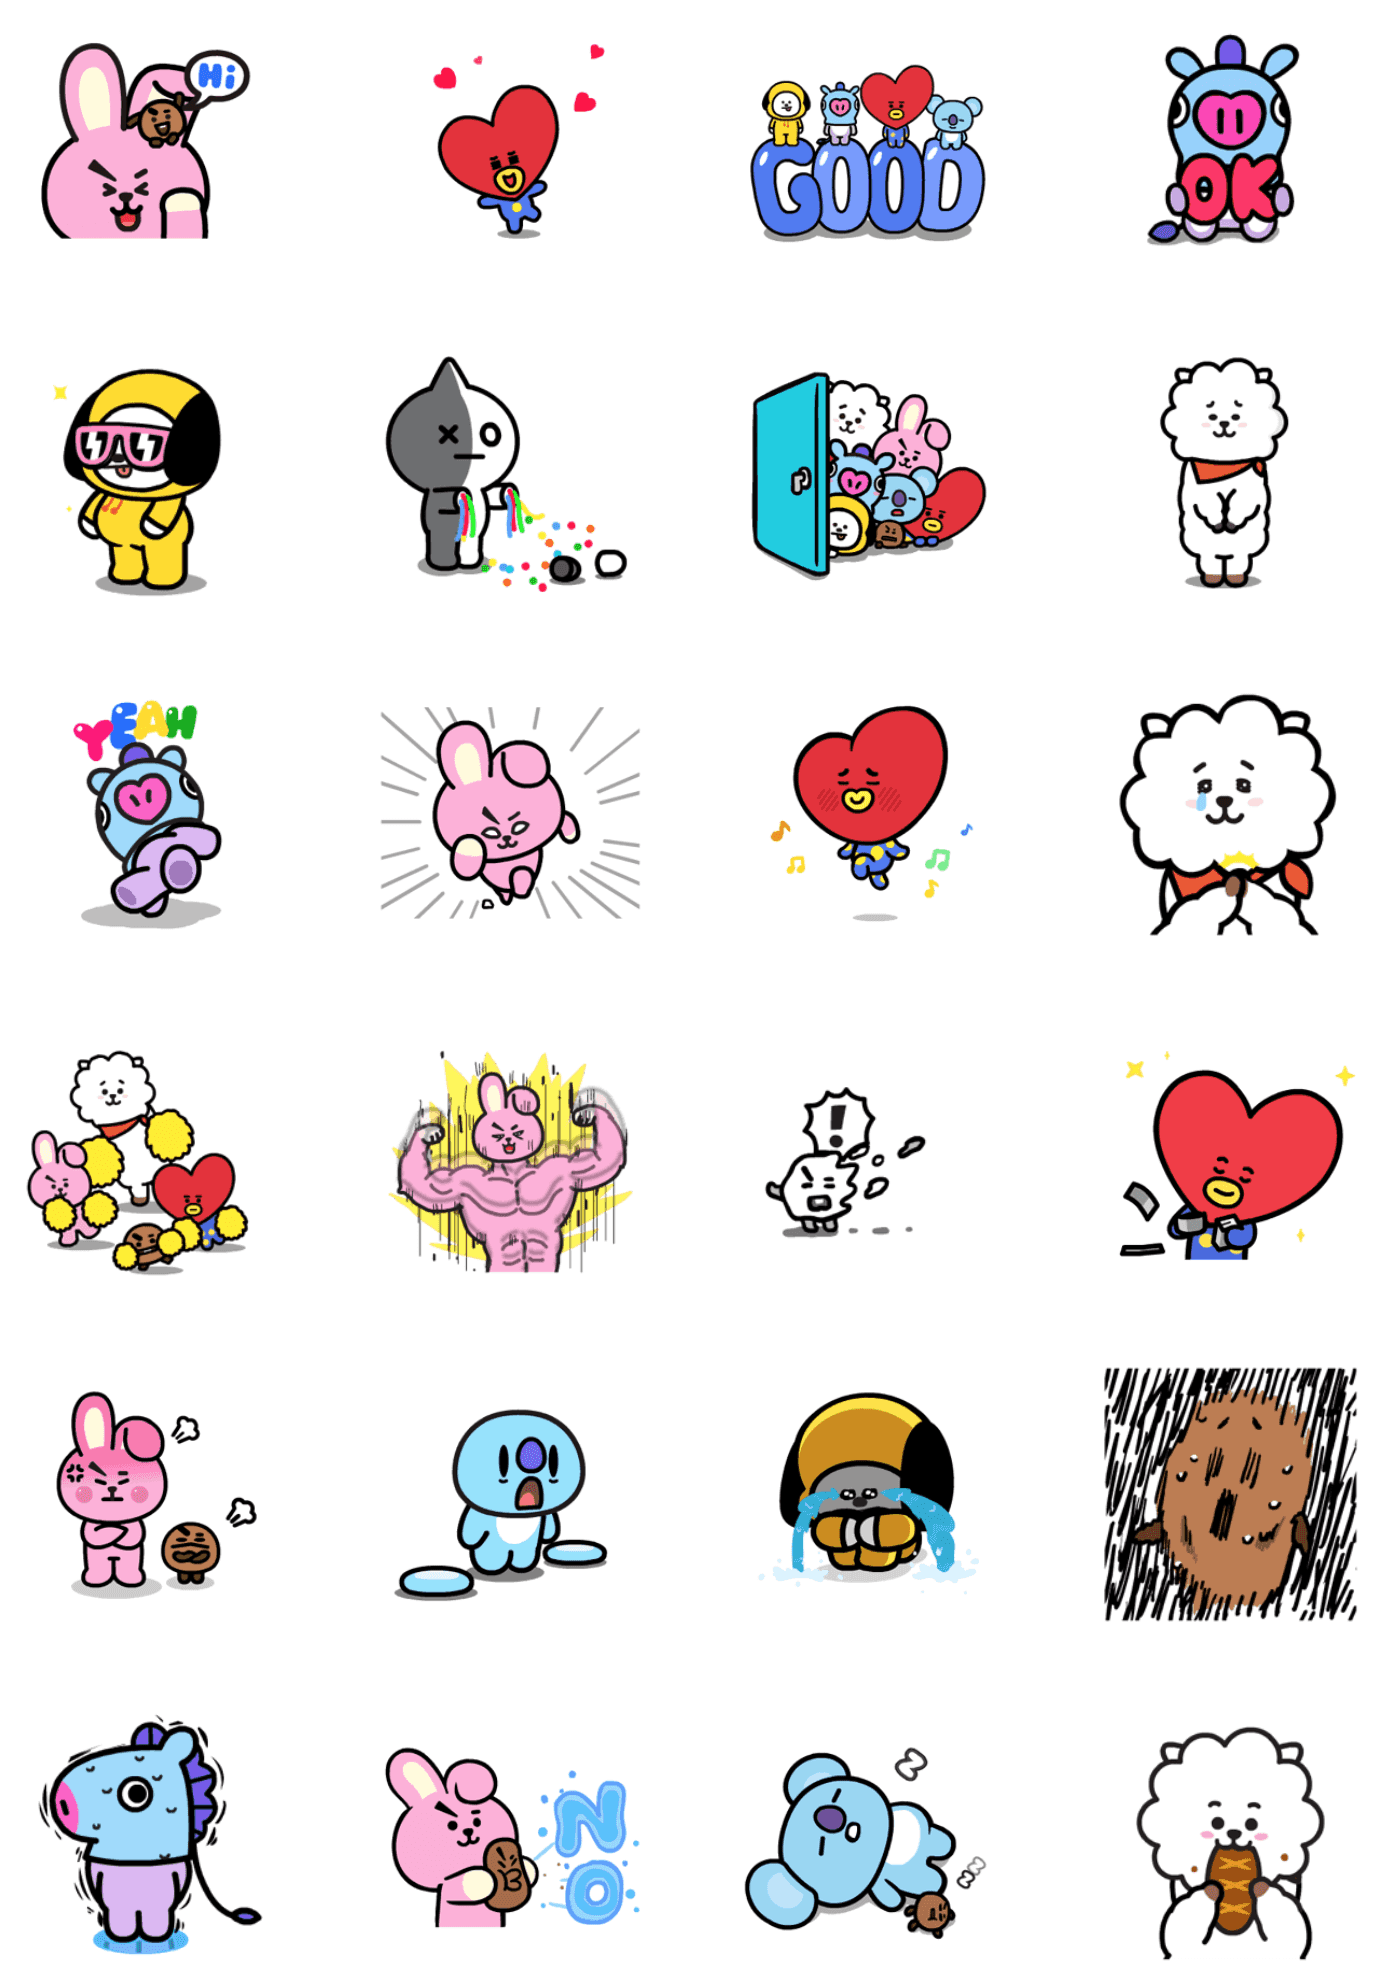 BT21 Sticker LINE BTS Resmi Hasil Kolaborasi bersama LINE Friends ... for Couple Sticker Line  67qdu